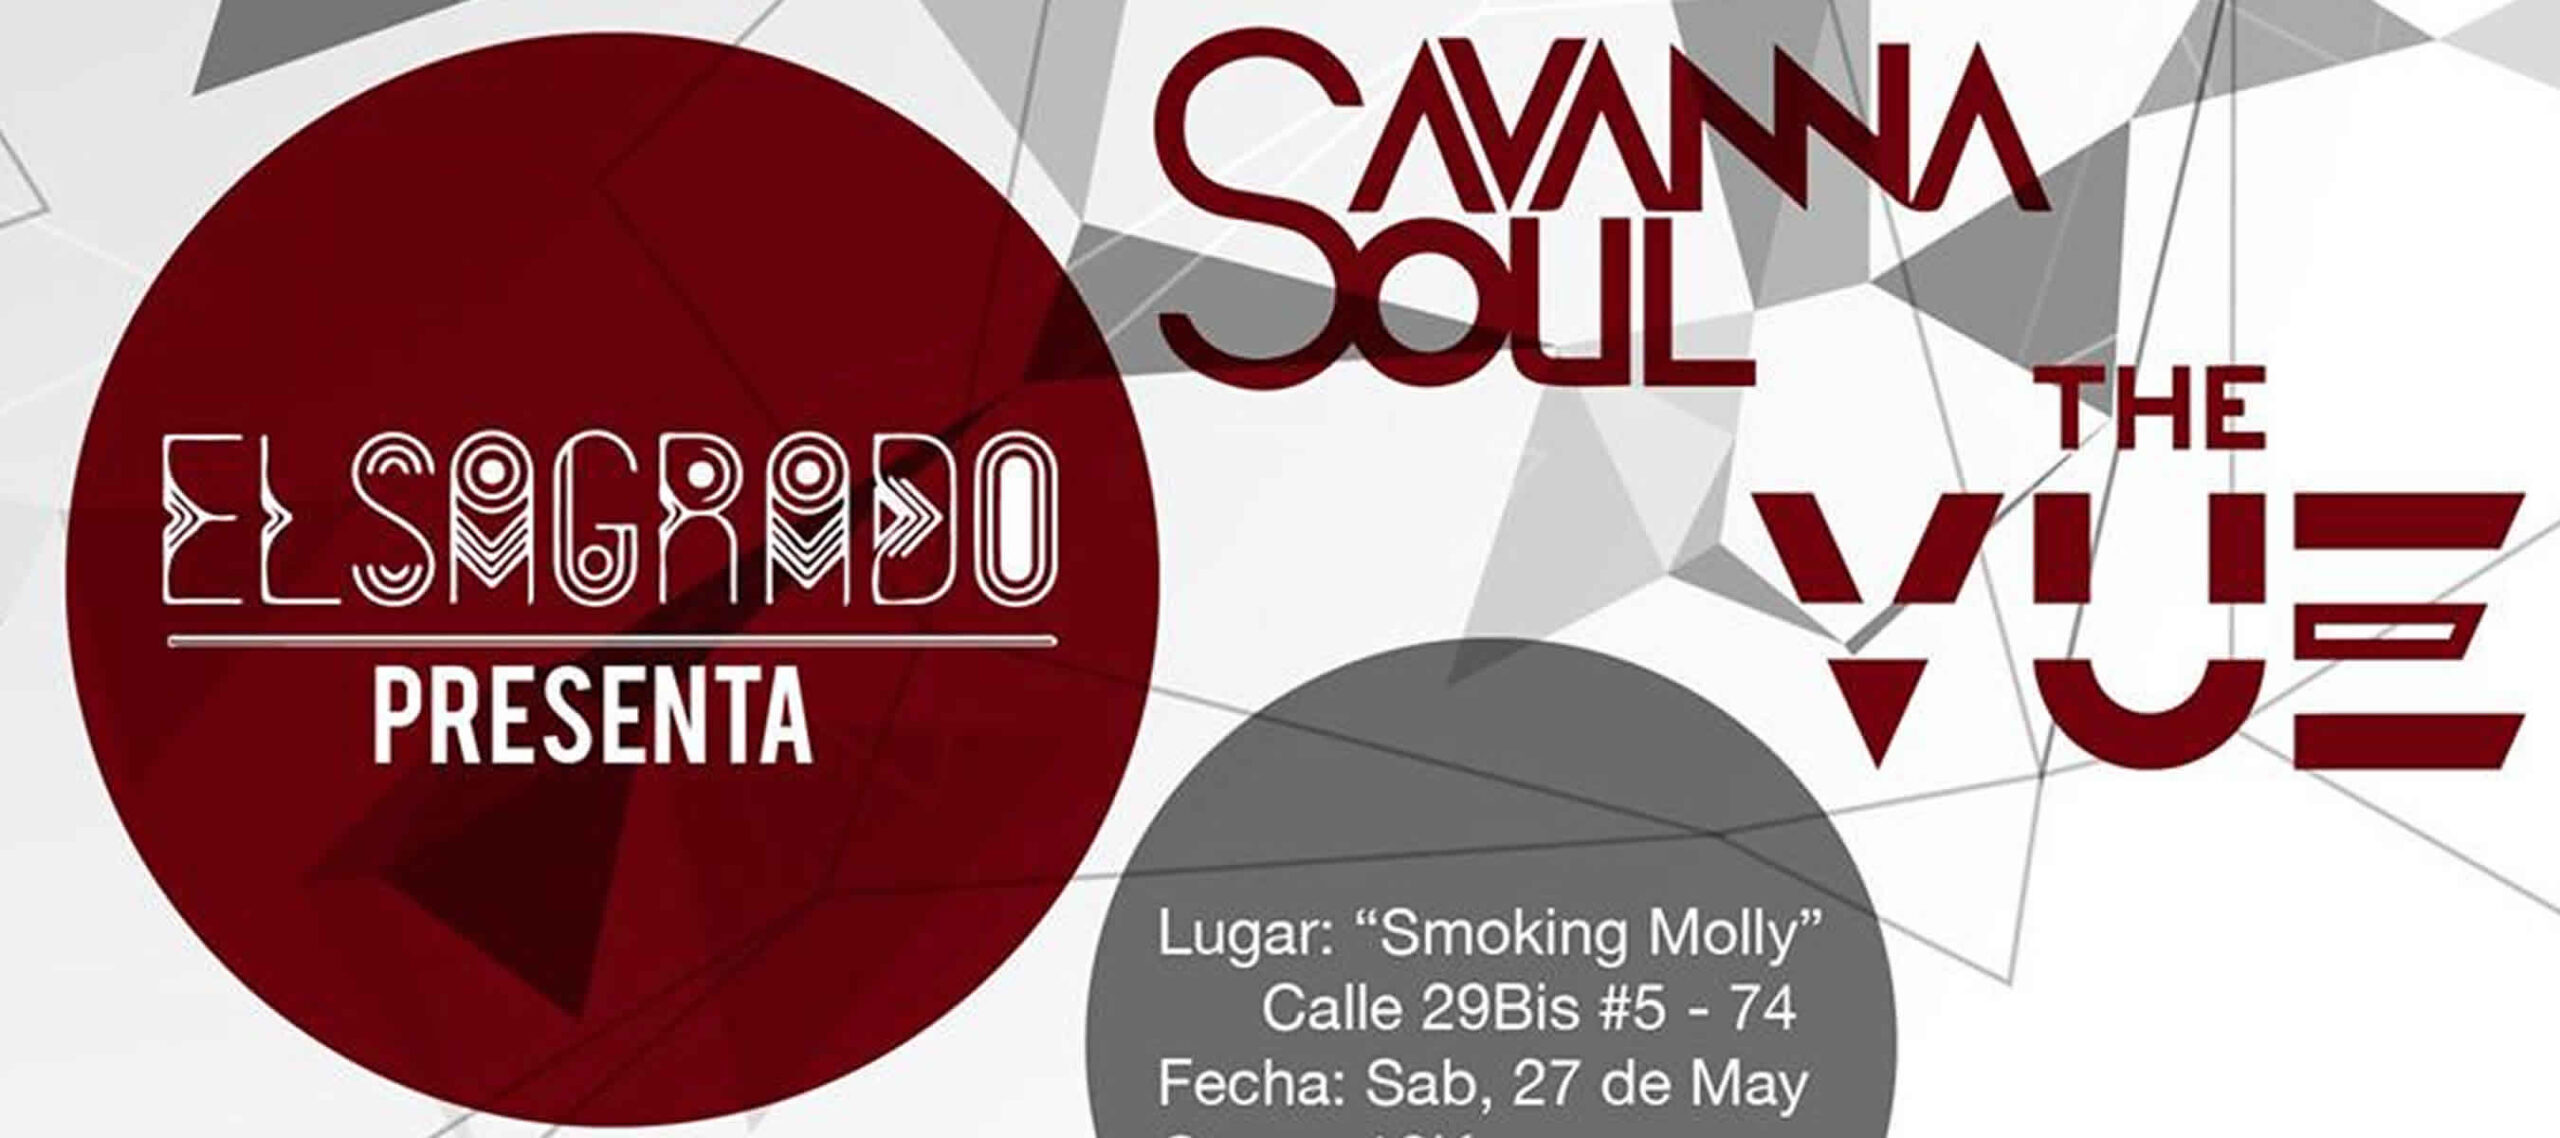 Savanna Soul & The Vue en vivo